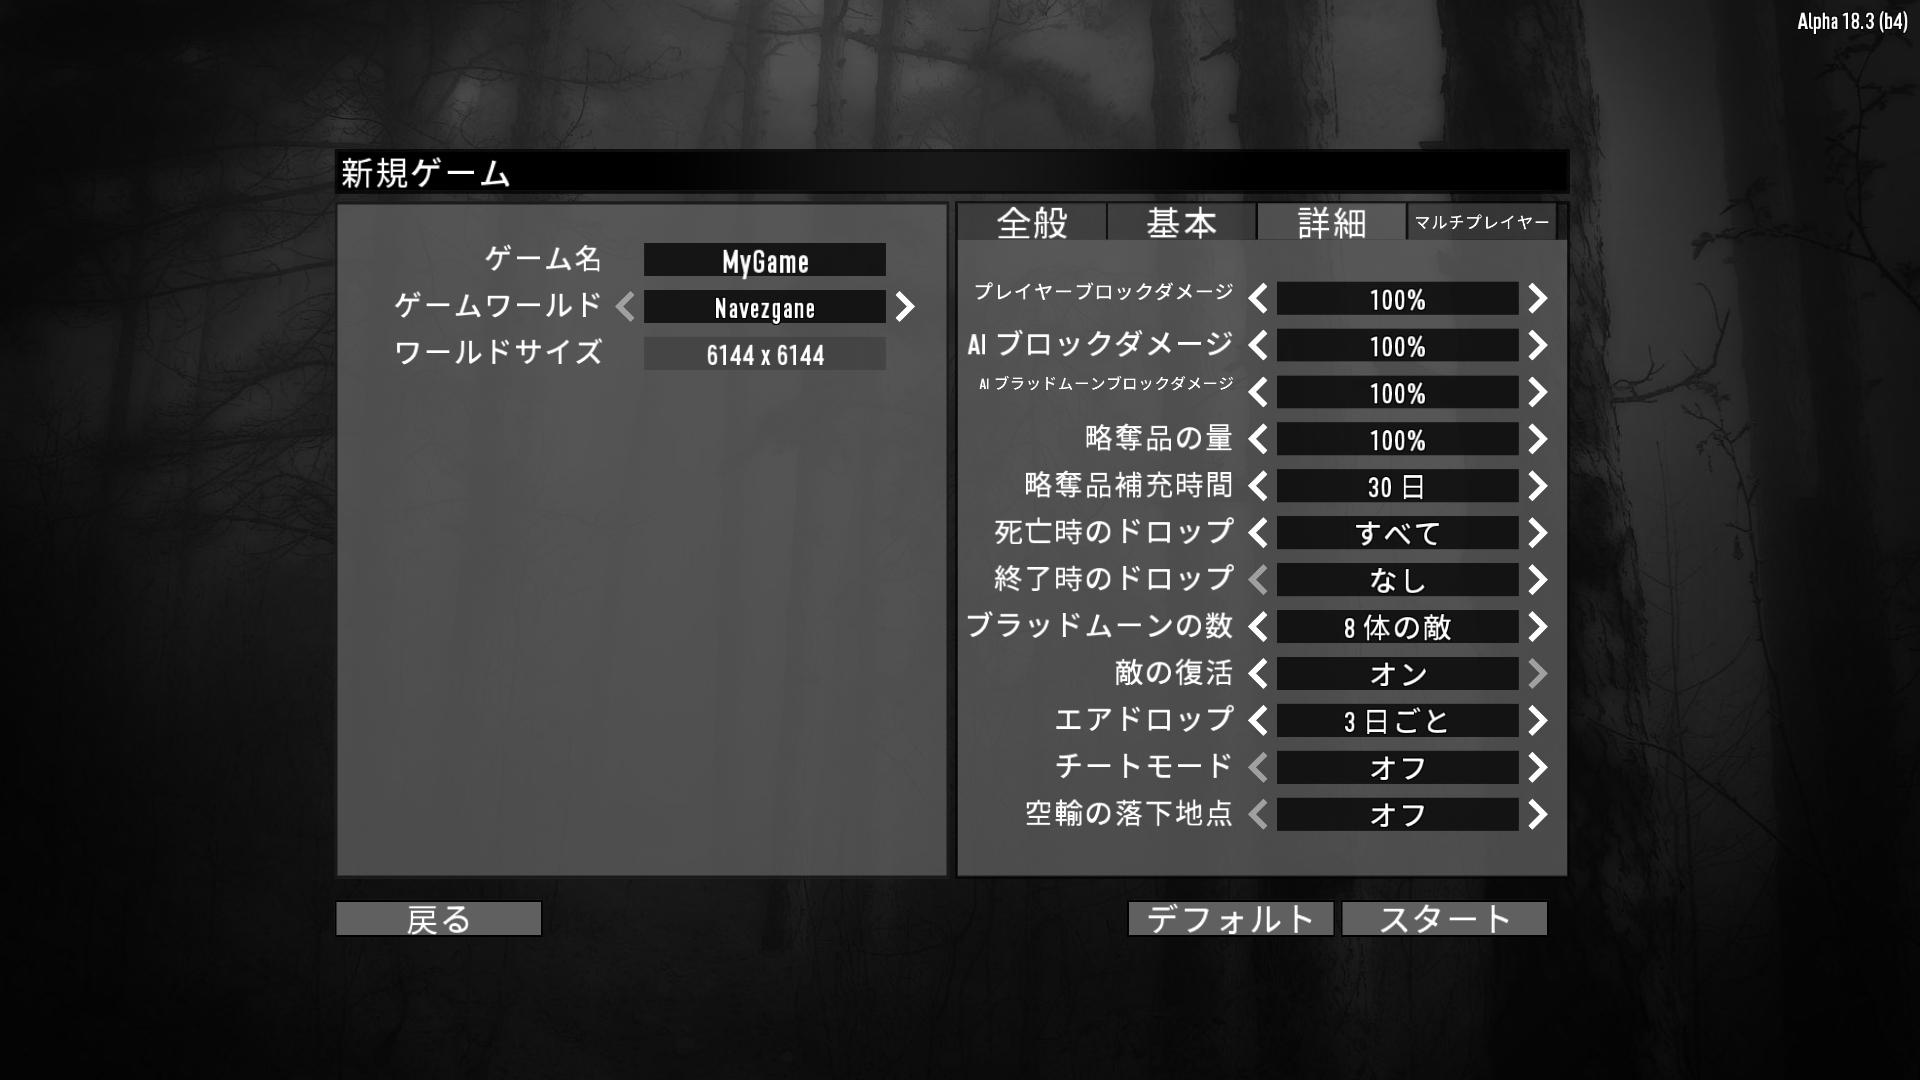 titleA18_advanced_jp.jpg